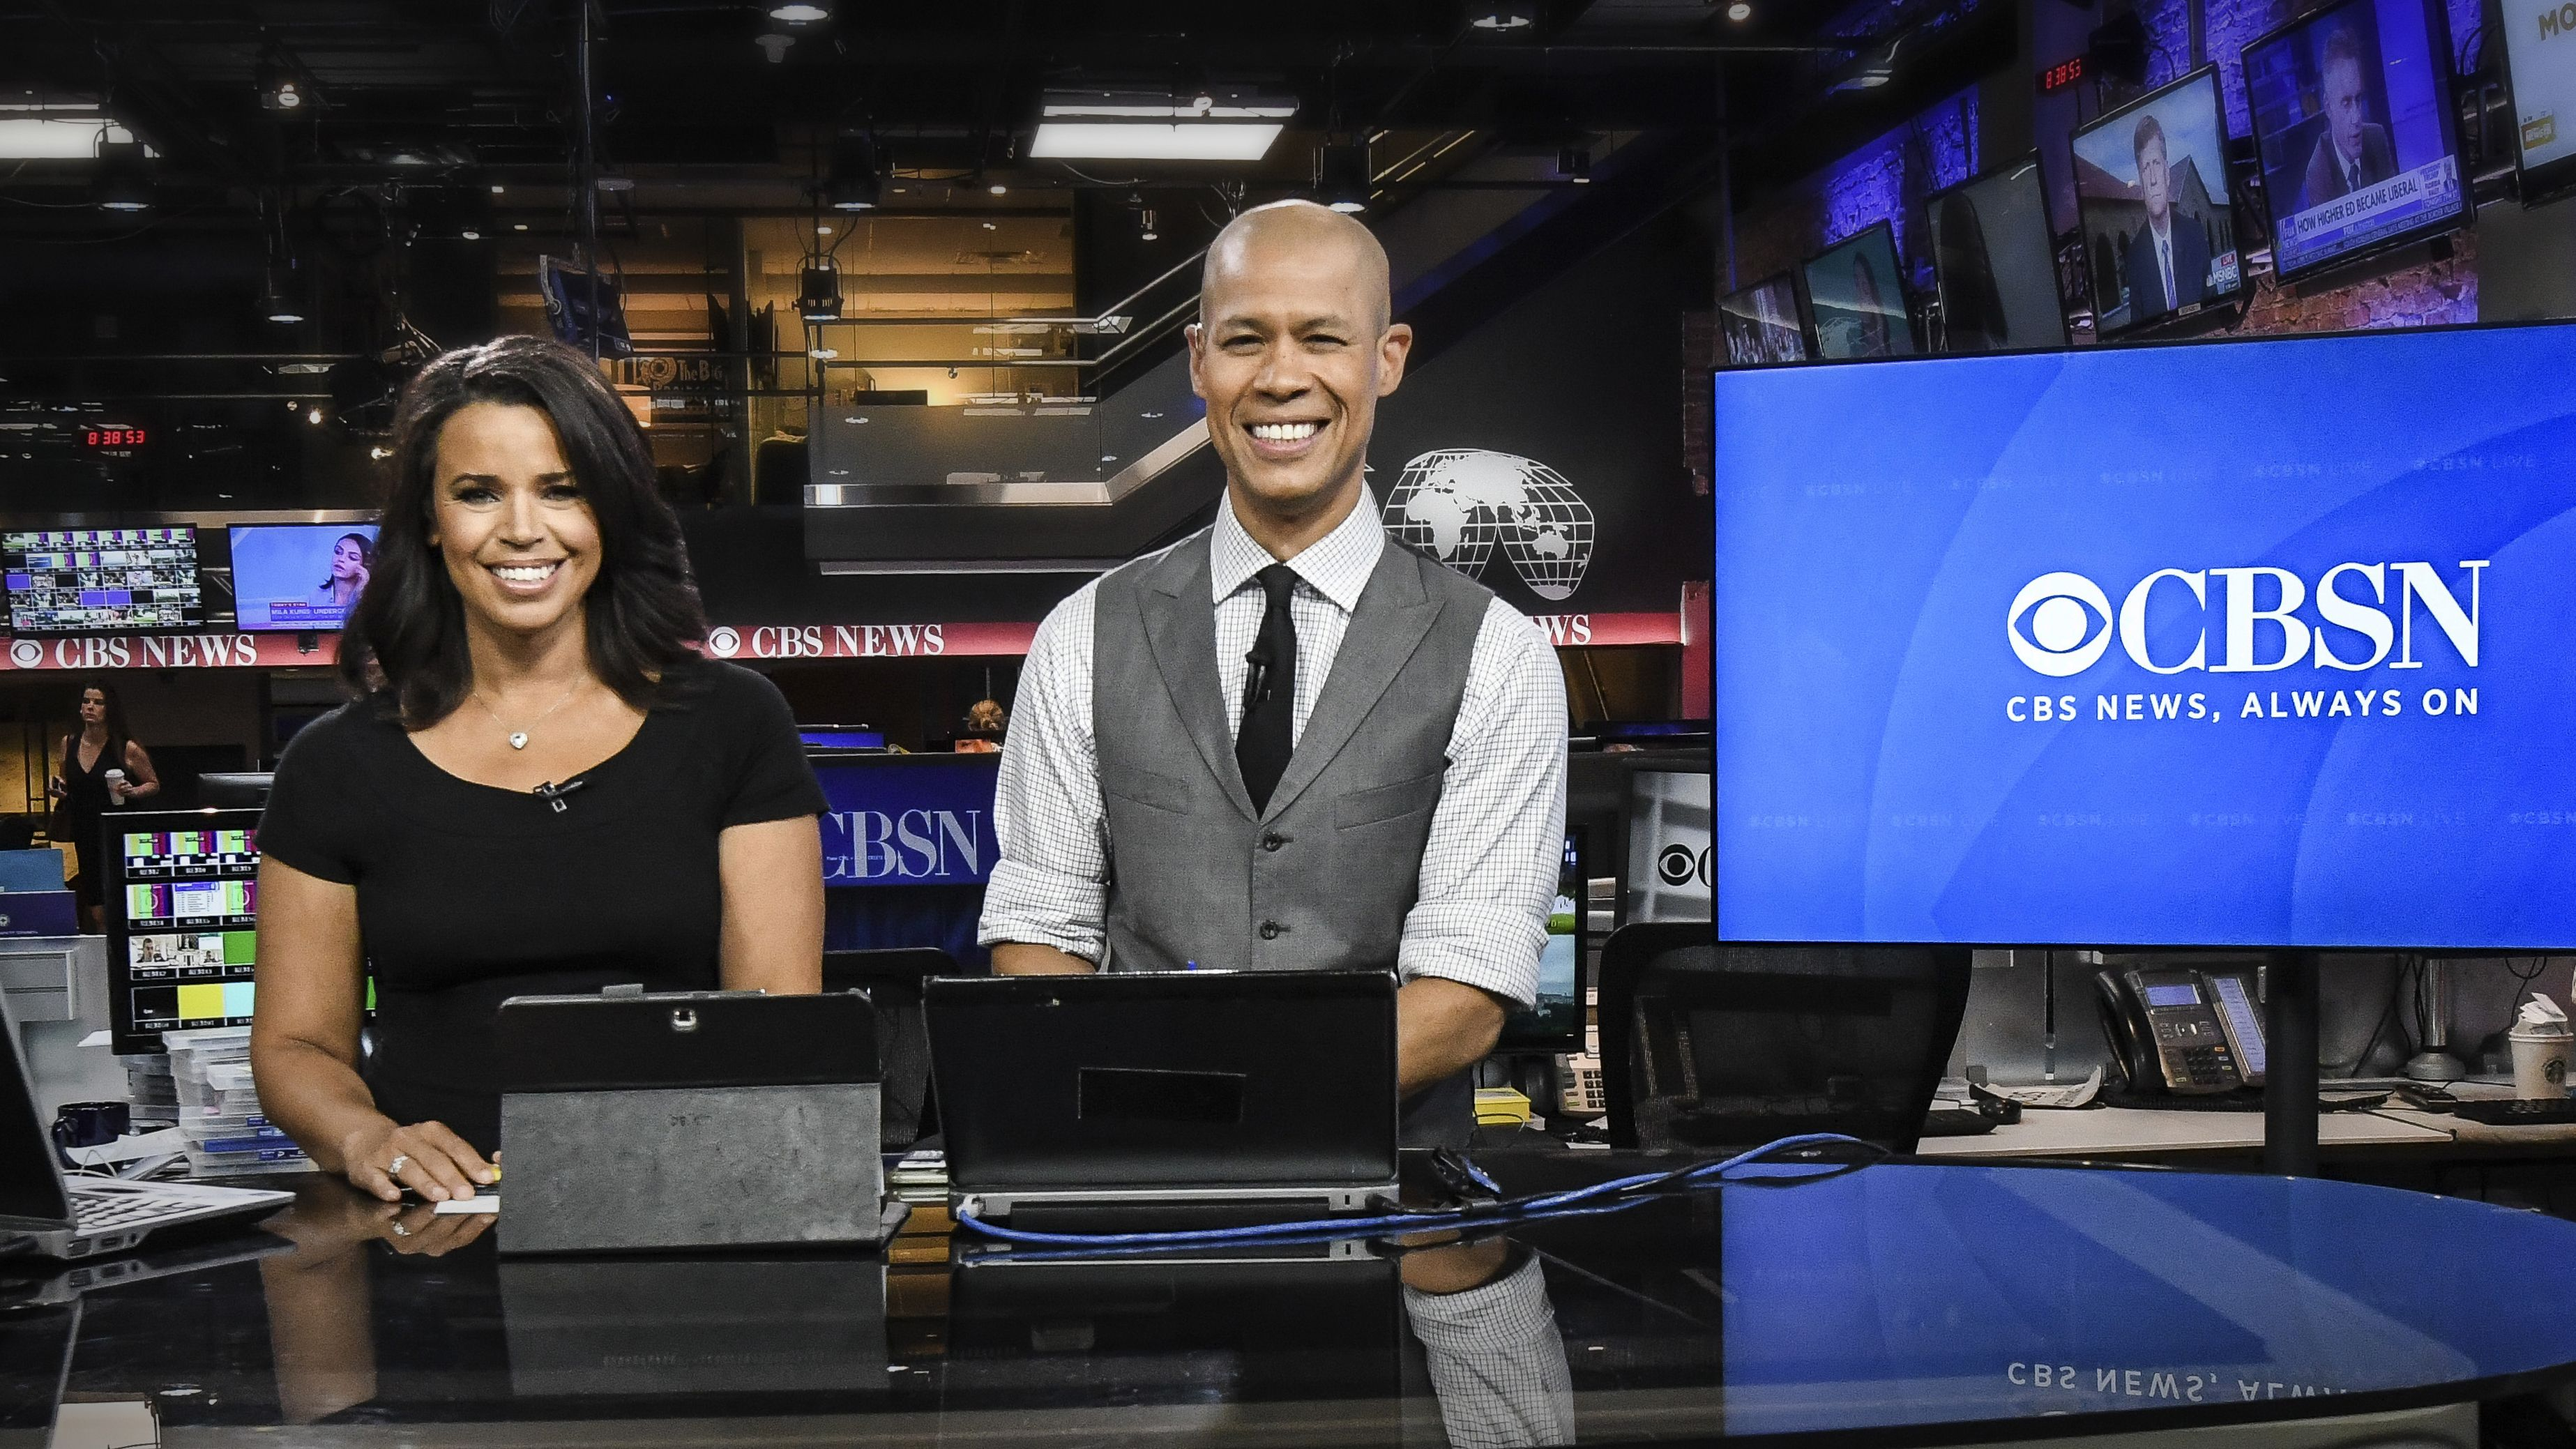 Live TV Streaming, On Demand, Originals, and Movies CBS